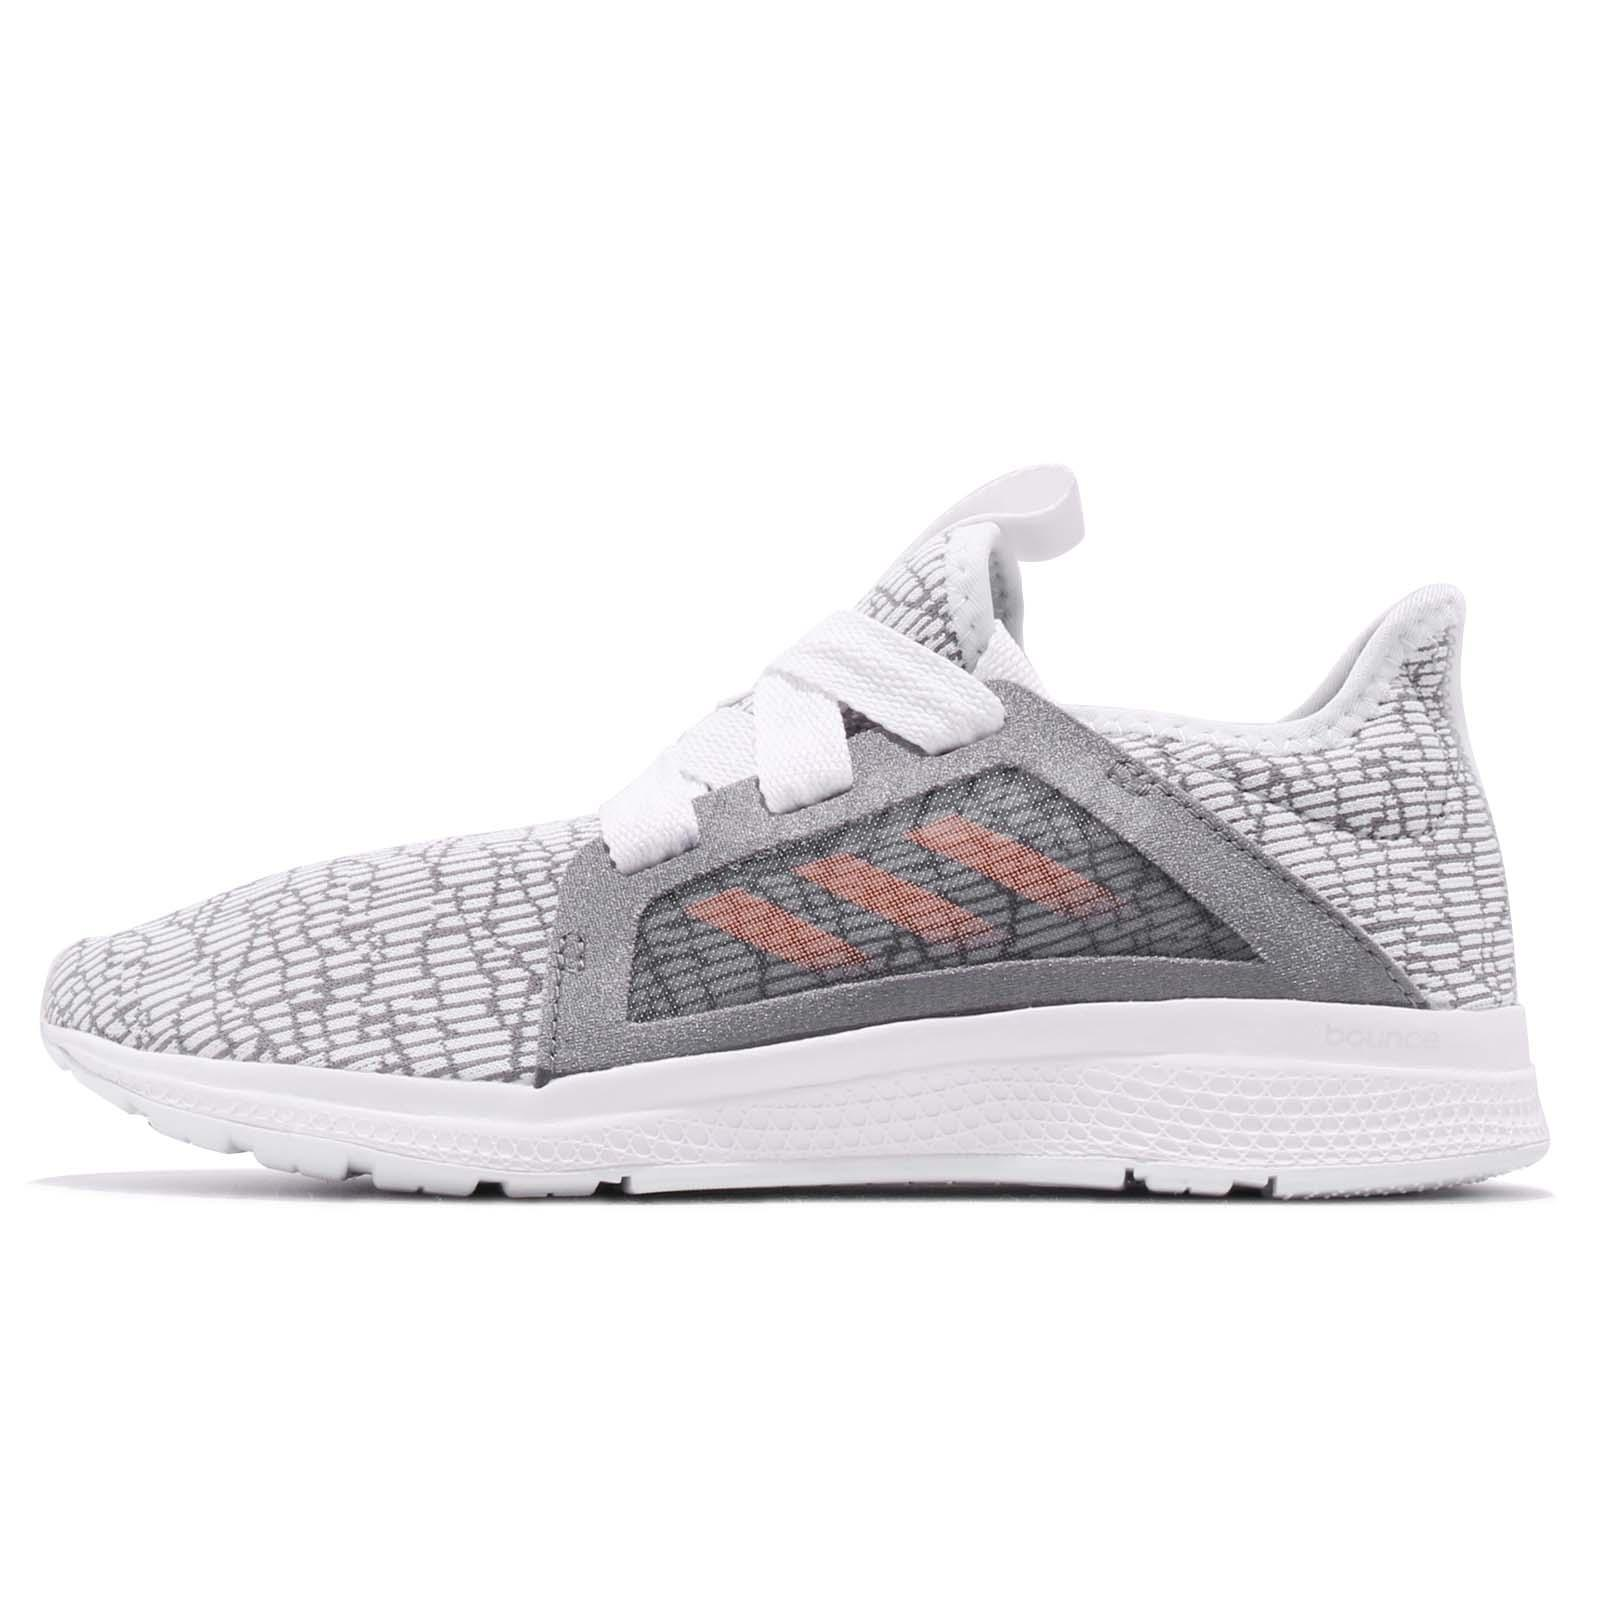 951334cd1 adidas Edge Lux J Grey Haze Coral White Kid Junior Women Running Shoes  B42194